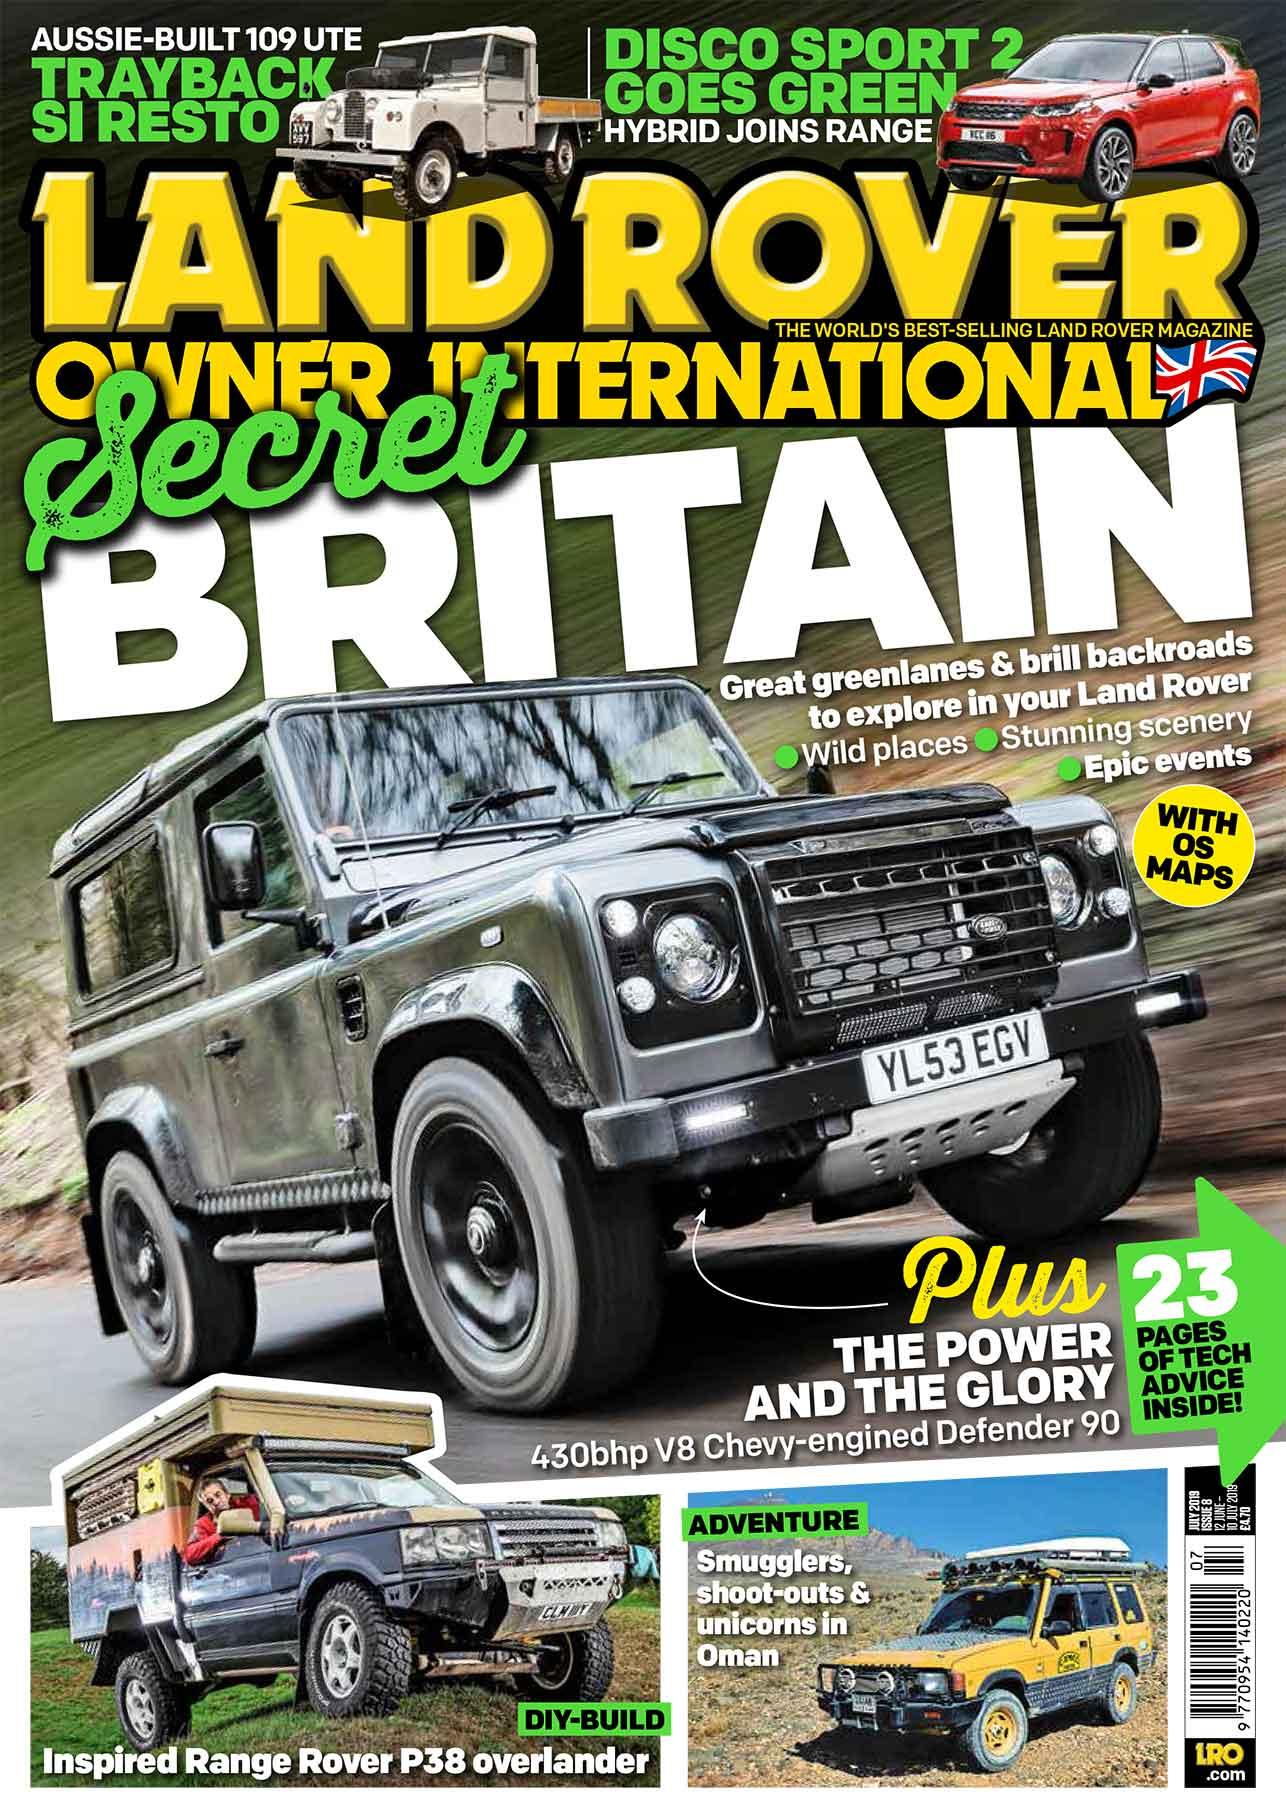 Land Rover Owner International magazine July 2019 — LRO